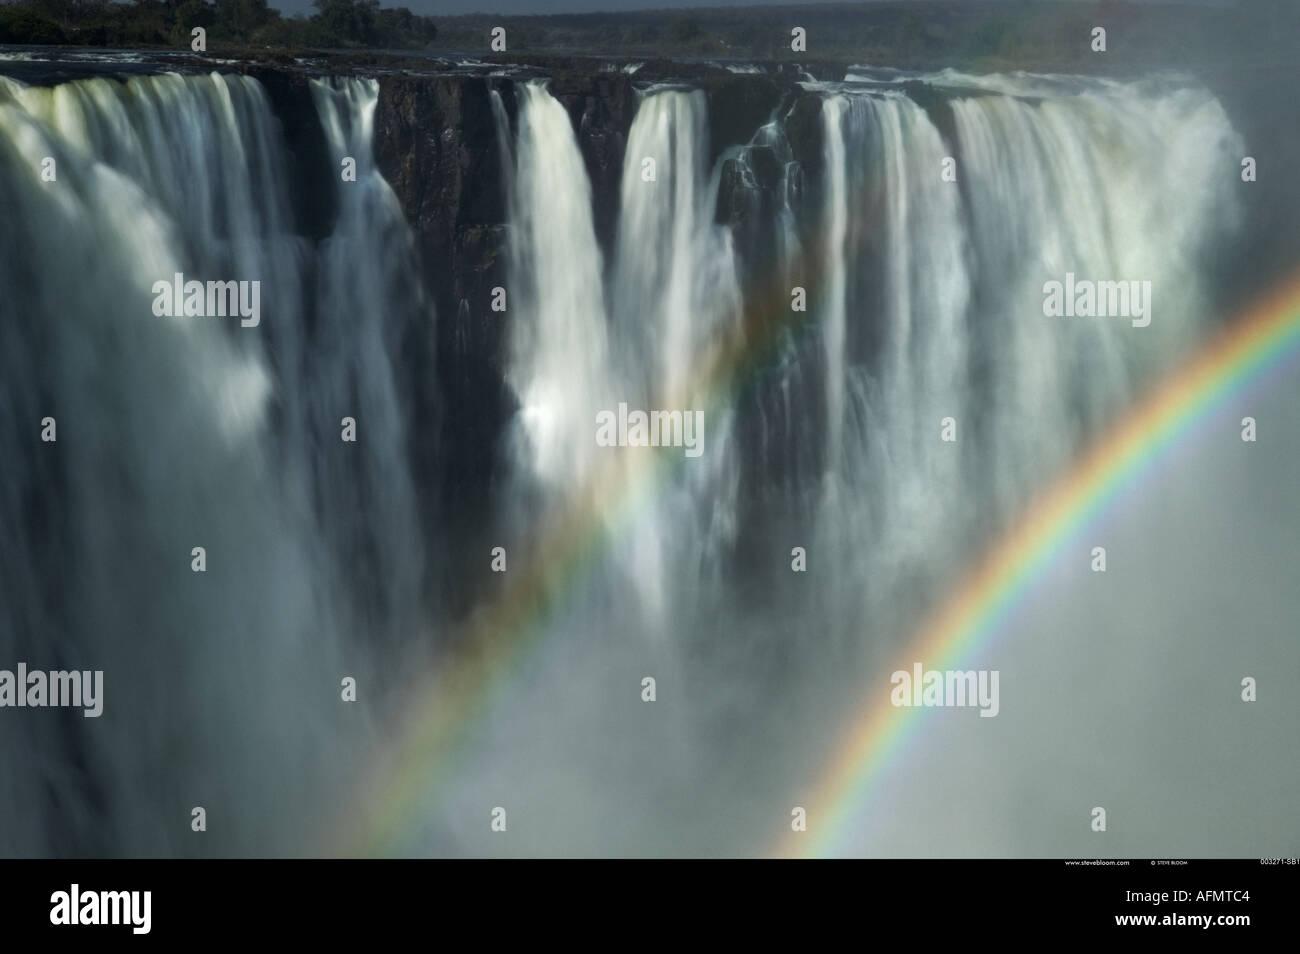 Double rainbow at Victoria Falls Zimbabwe - Stock Image